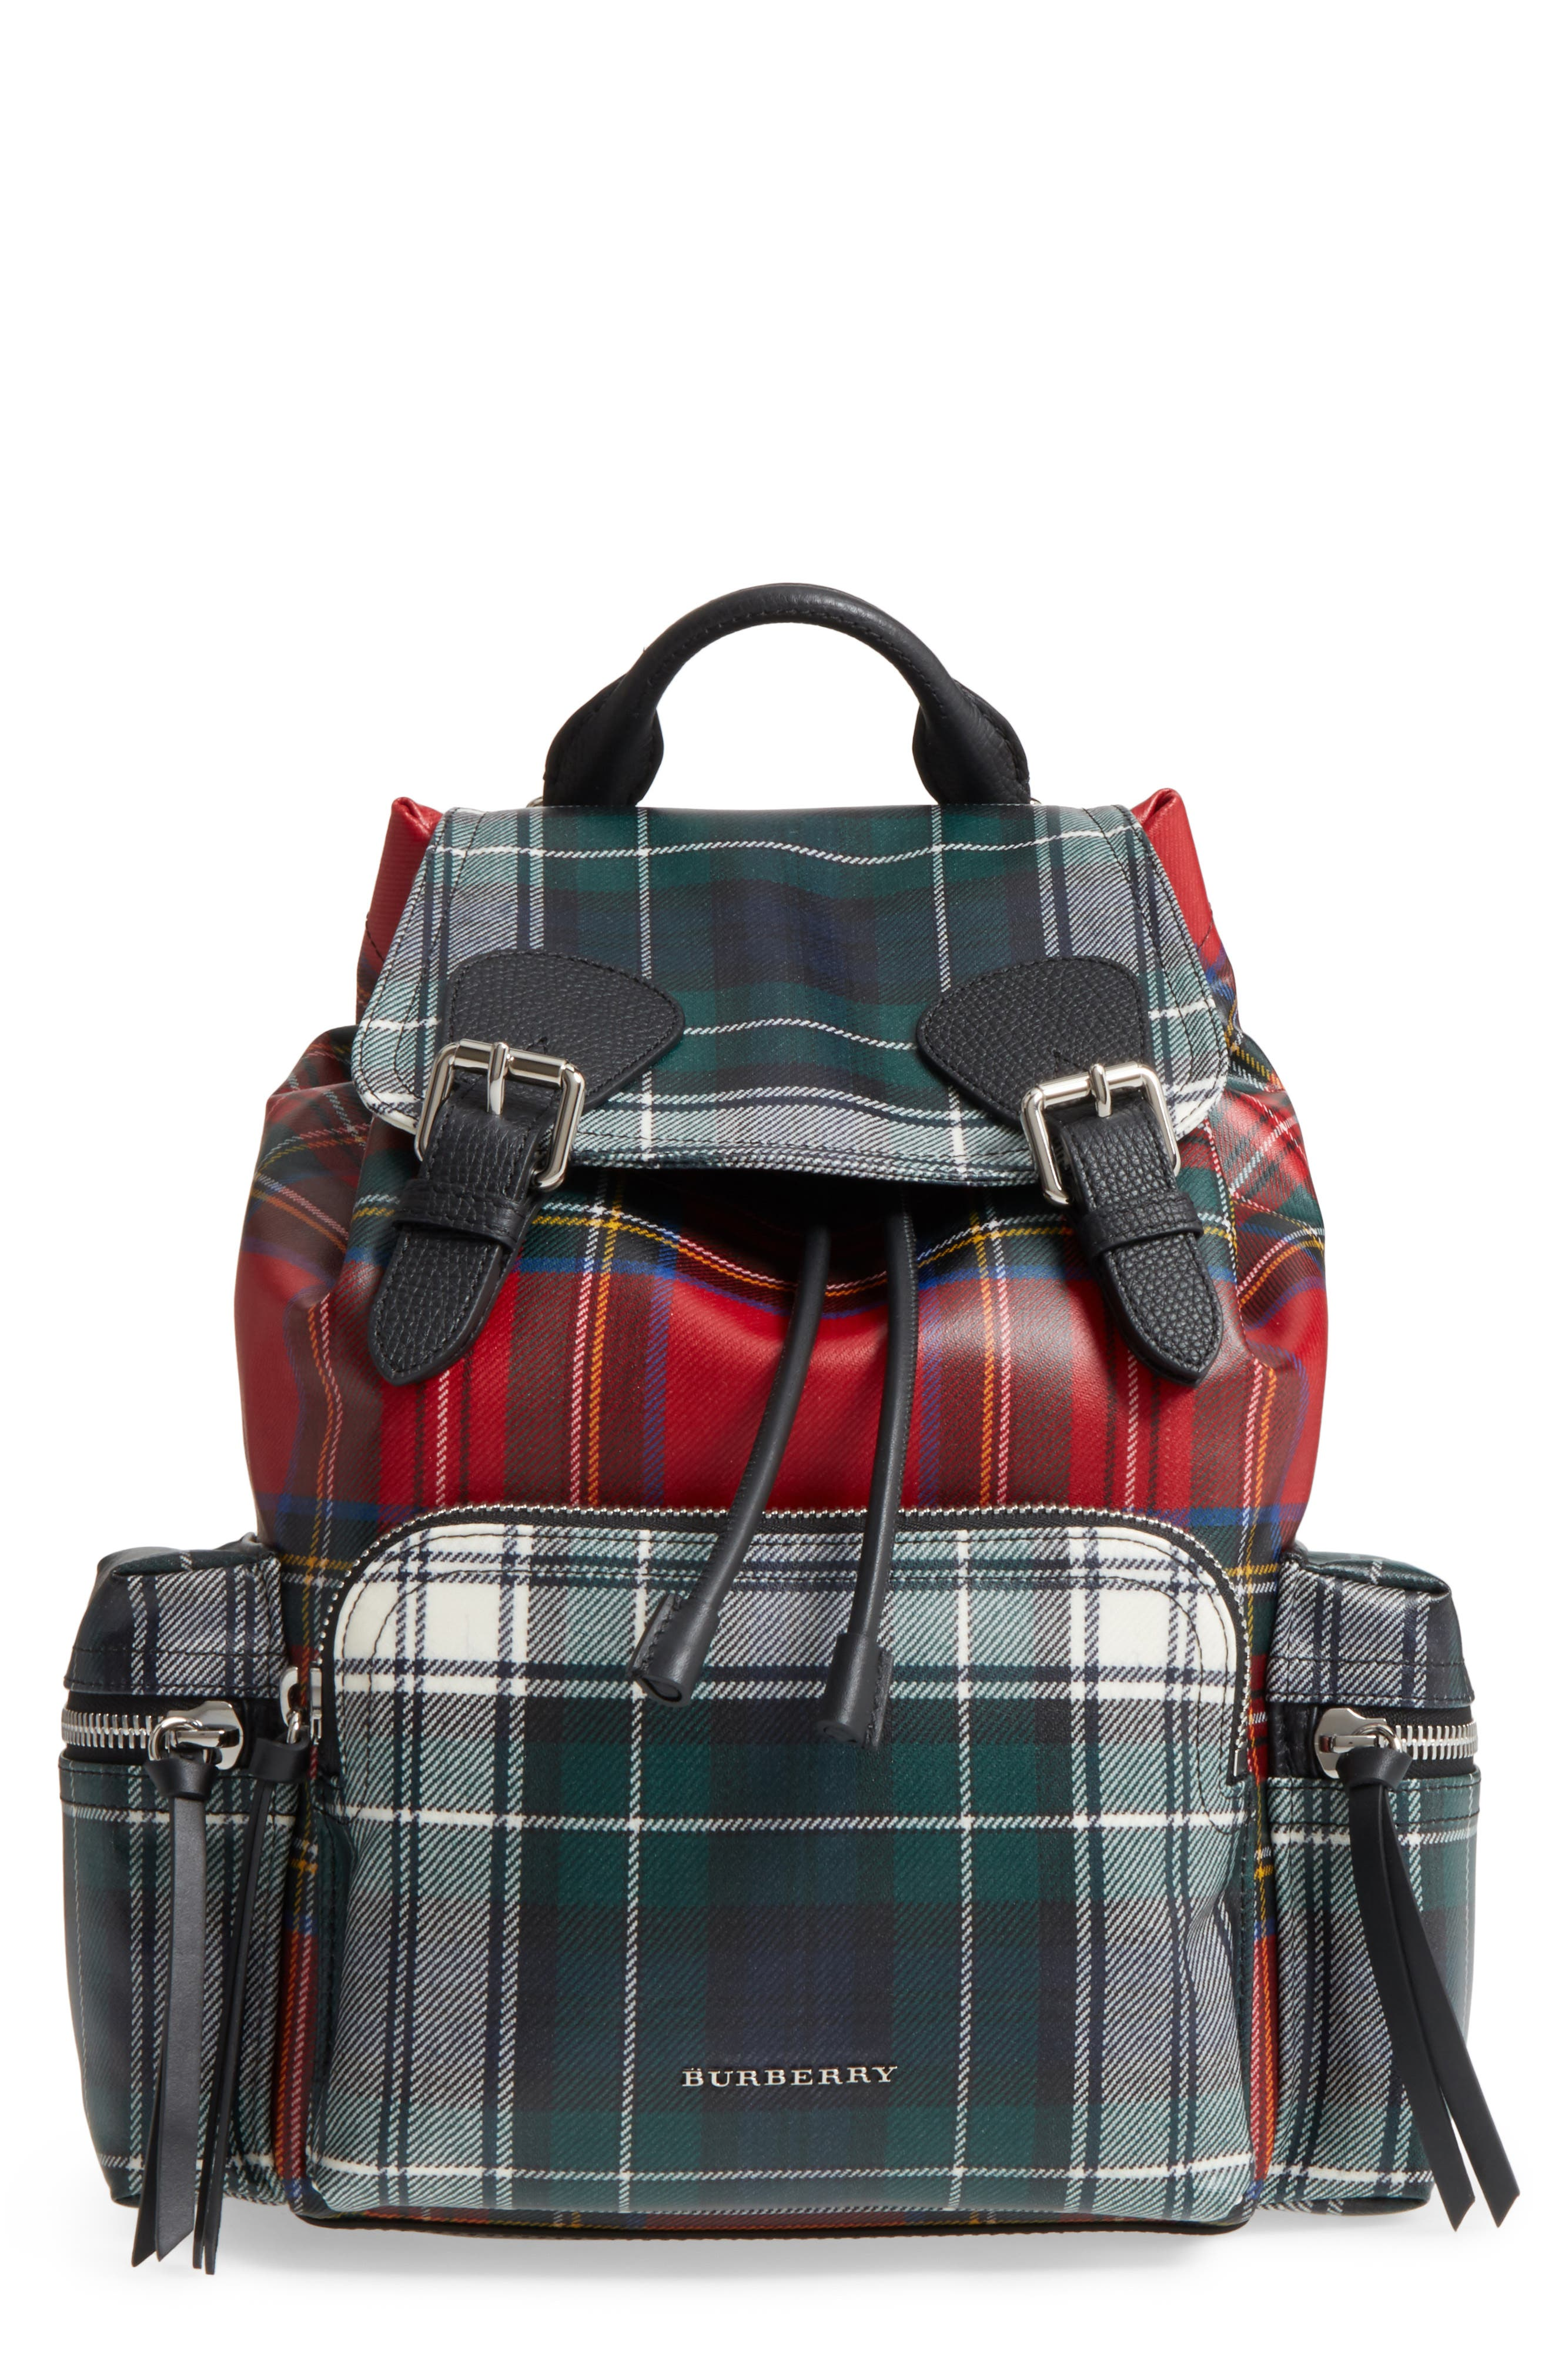 Burberry Medium Rucksack Laminated Tartan Backpack